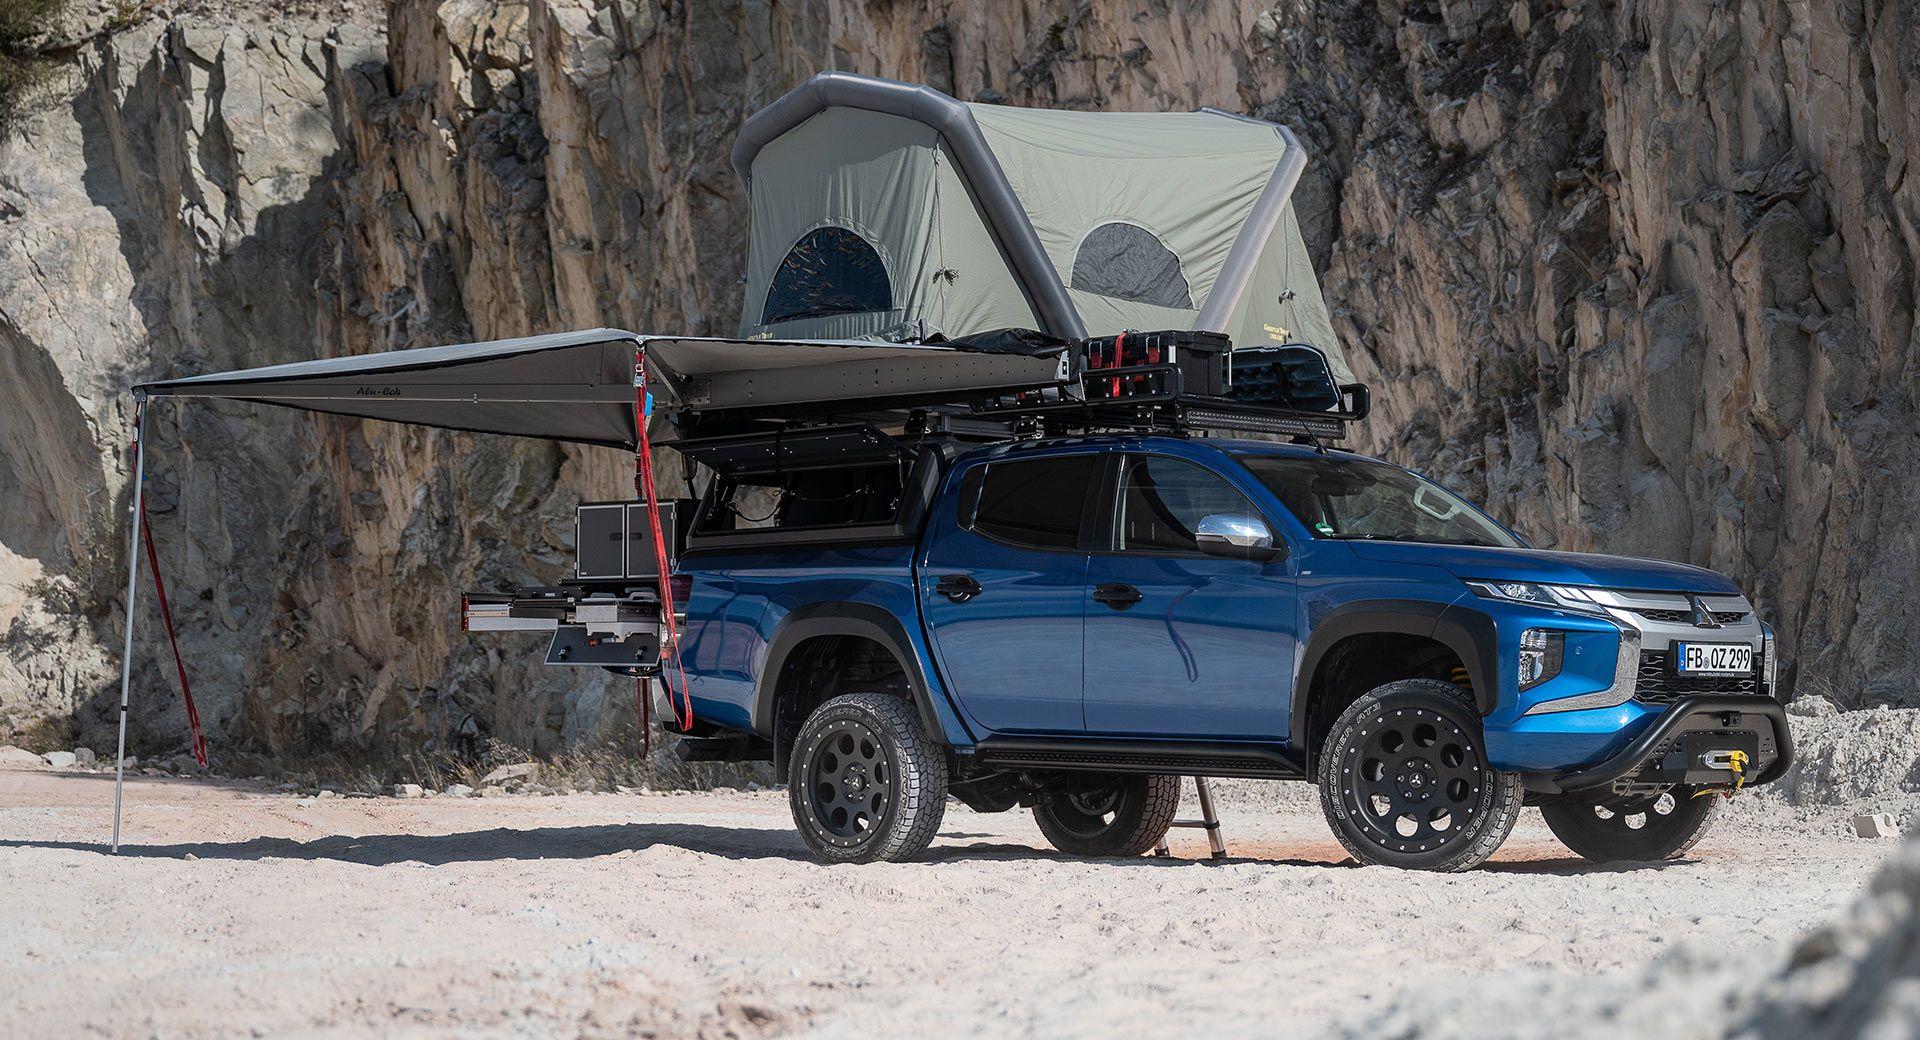 Mitsubishi-L200-Camping-Accessories-9